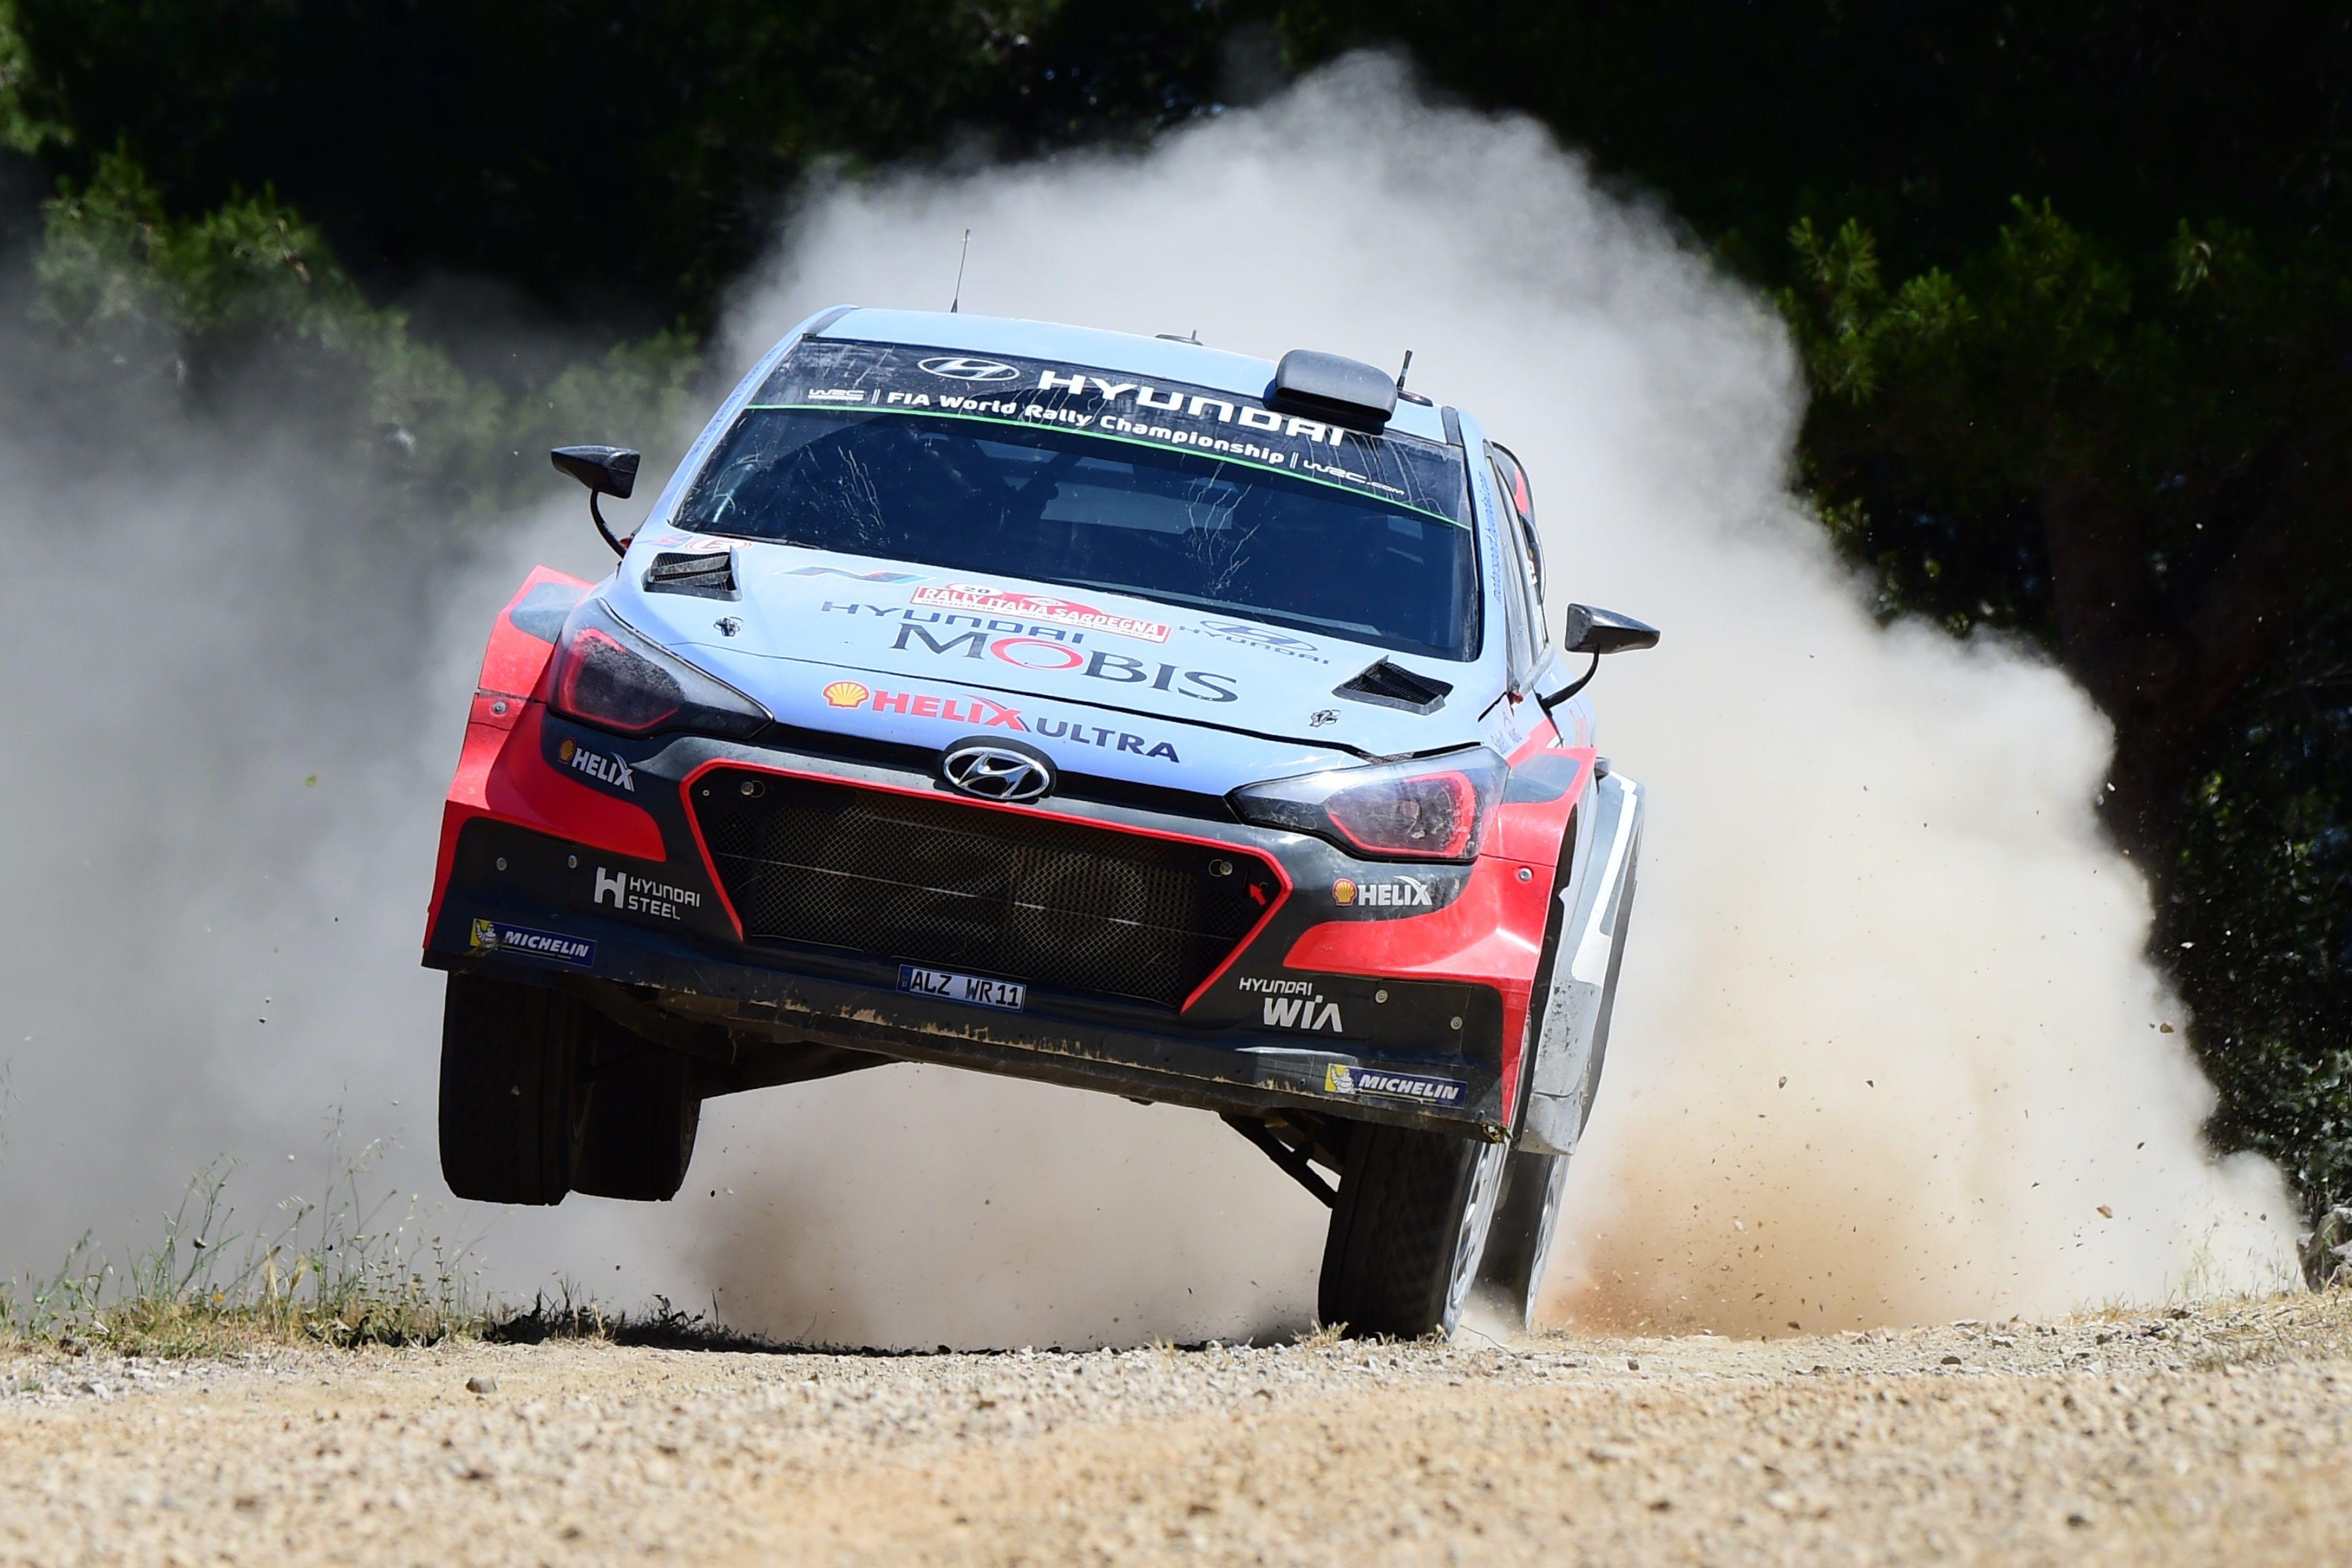 Rallye - Neuville r�siste � Latvala, Ogier 3e